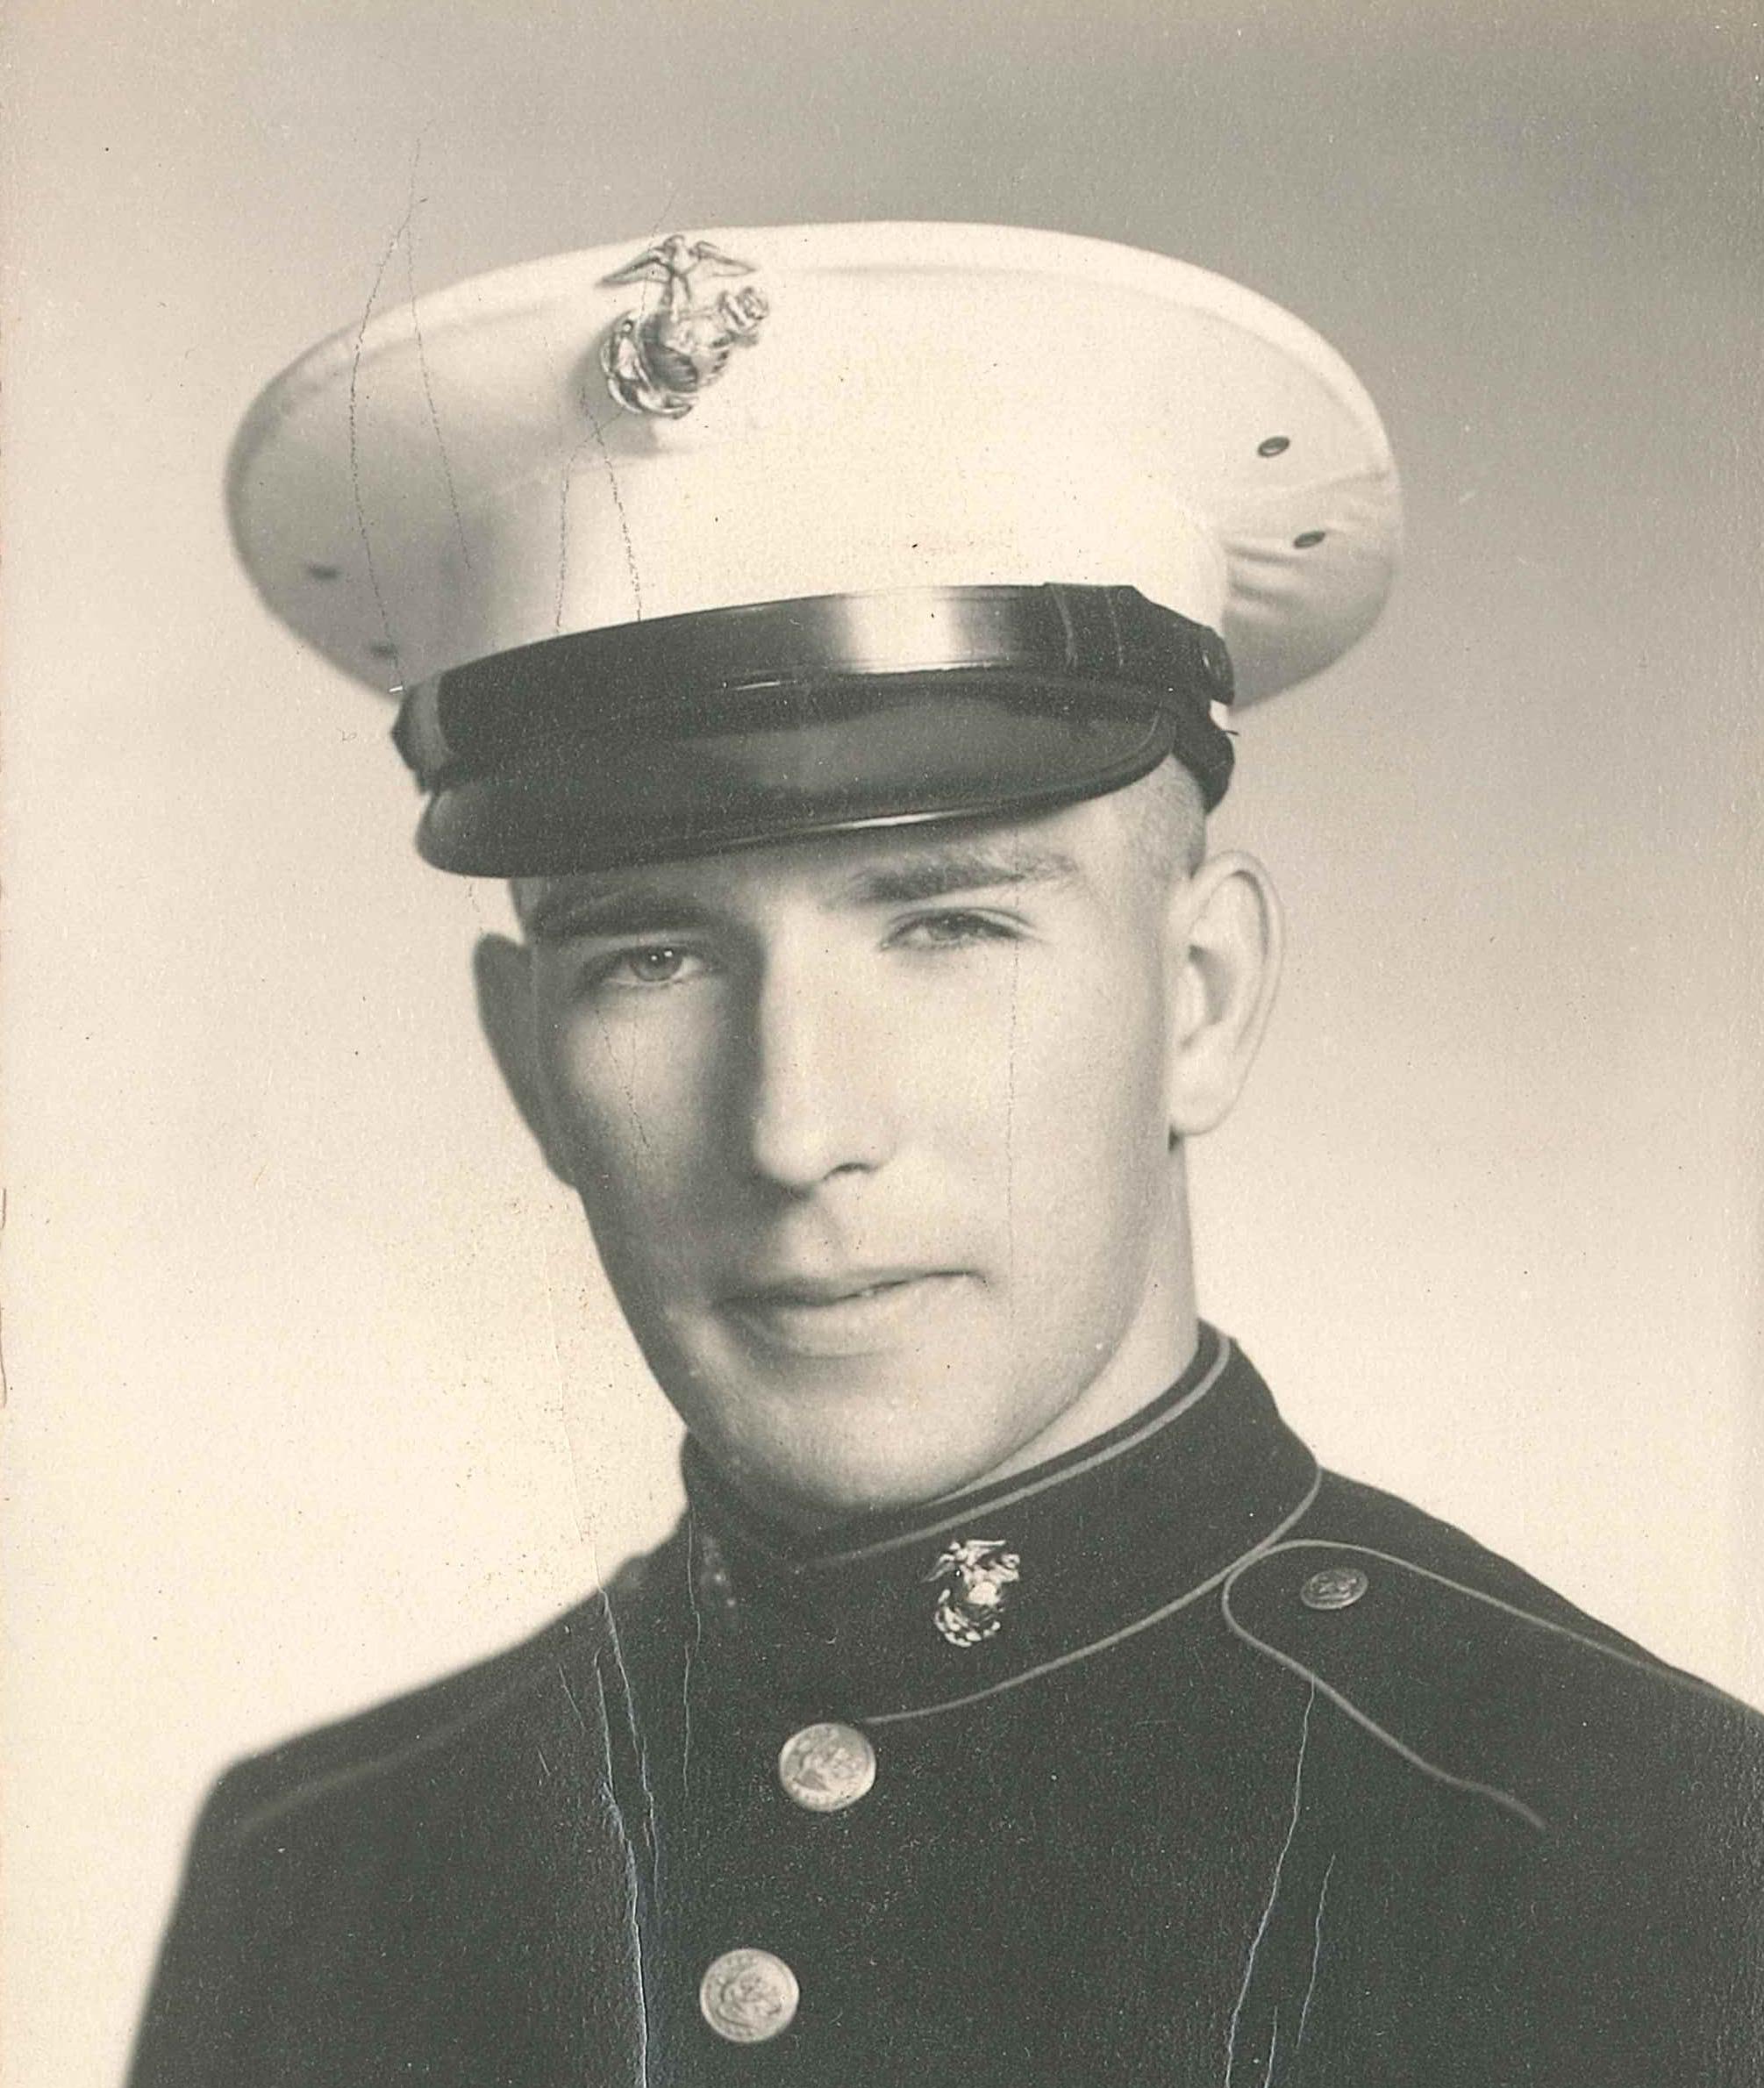 William Popson, Sr. Obituary, Warren, OH :: Carl W. Hall Funeral ...